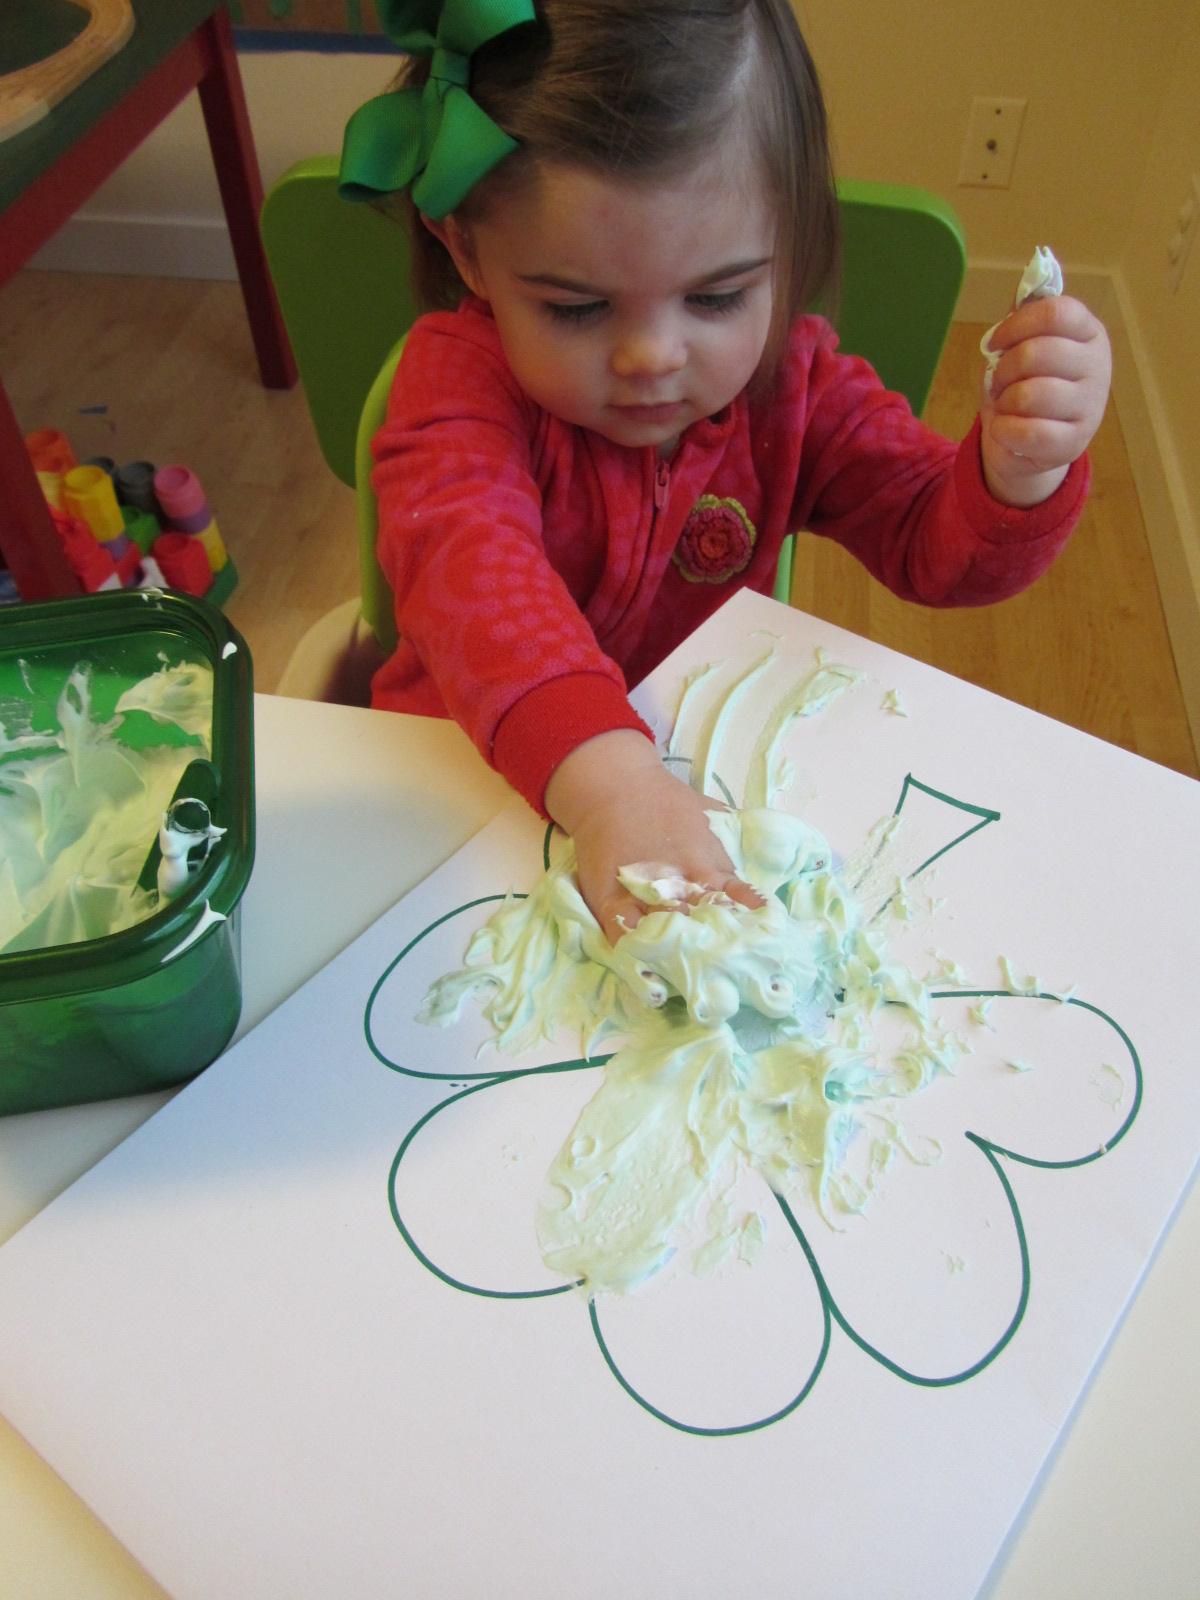 St patricks crafts for preschoolers - She